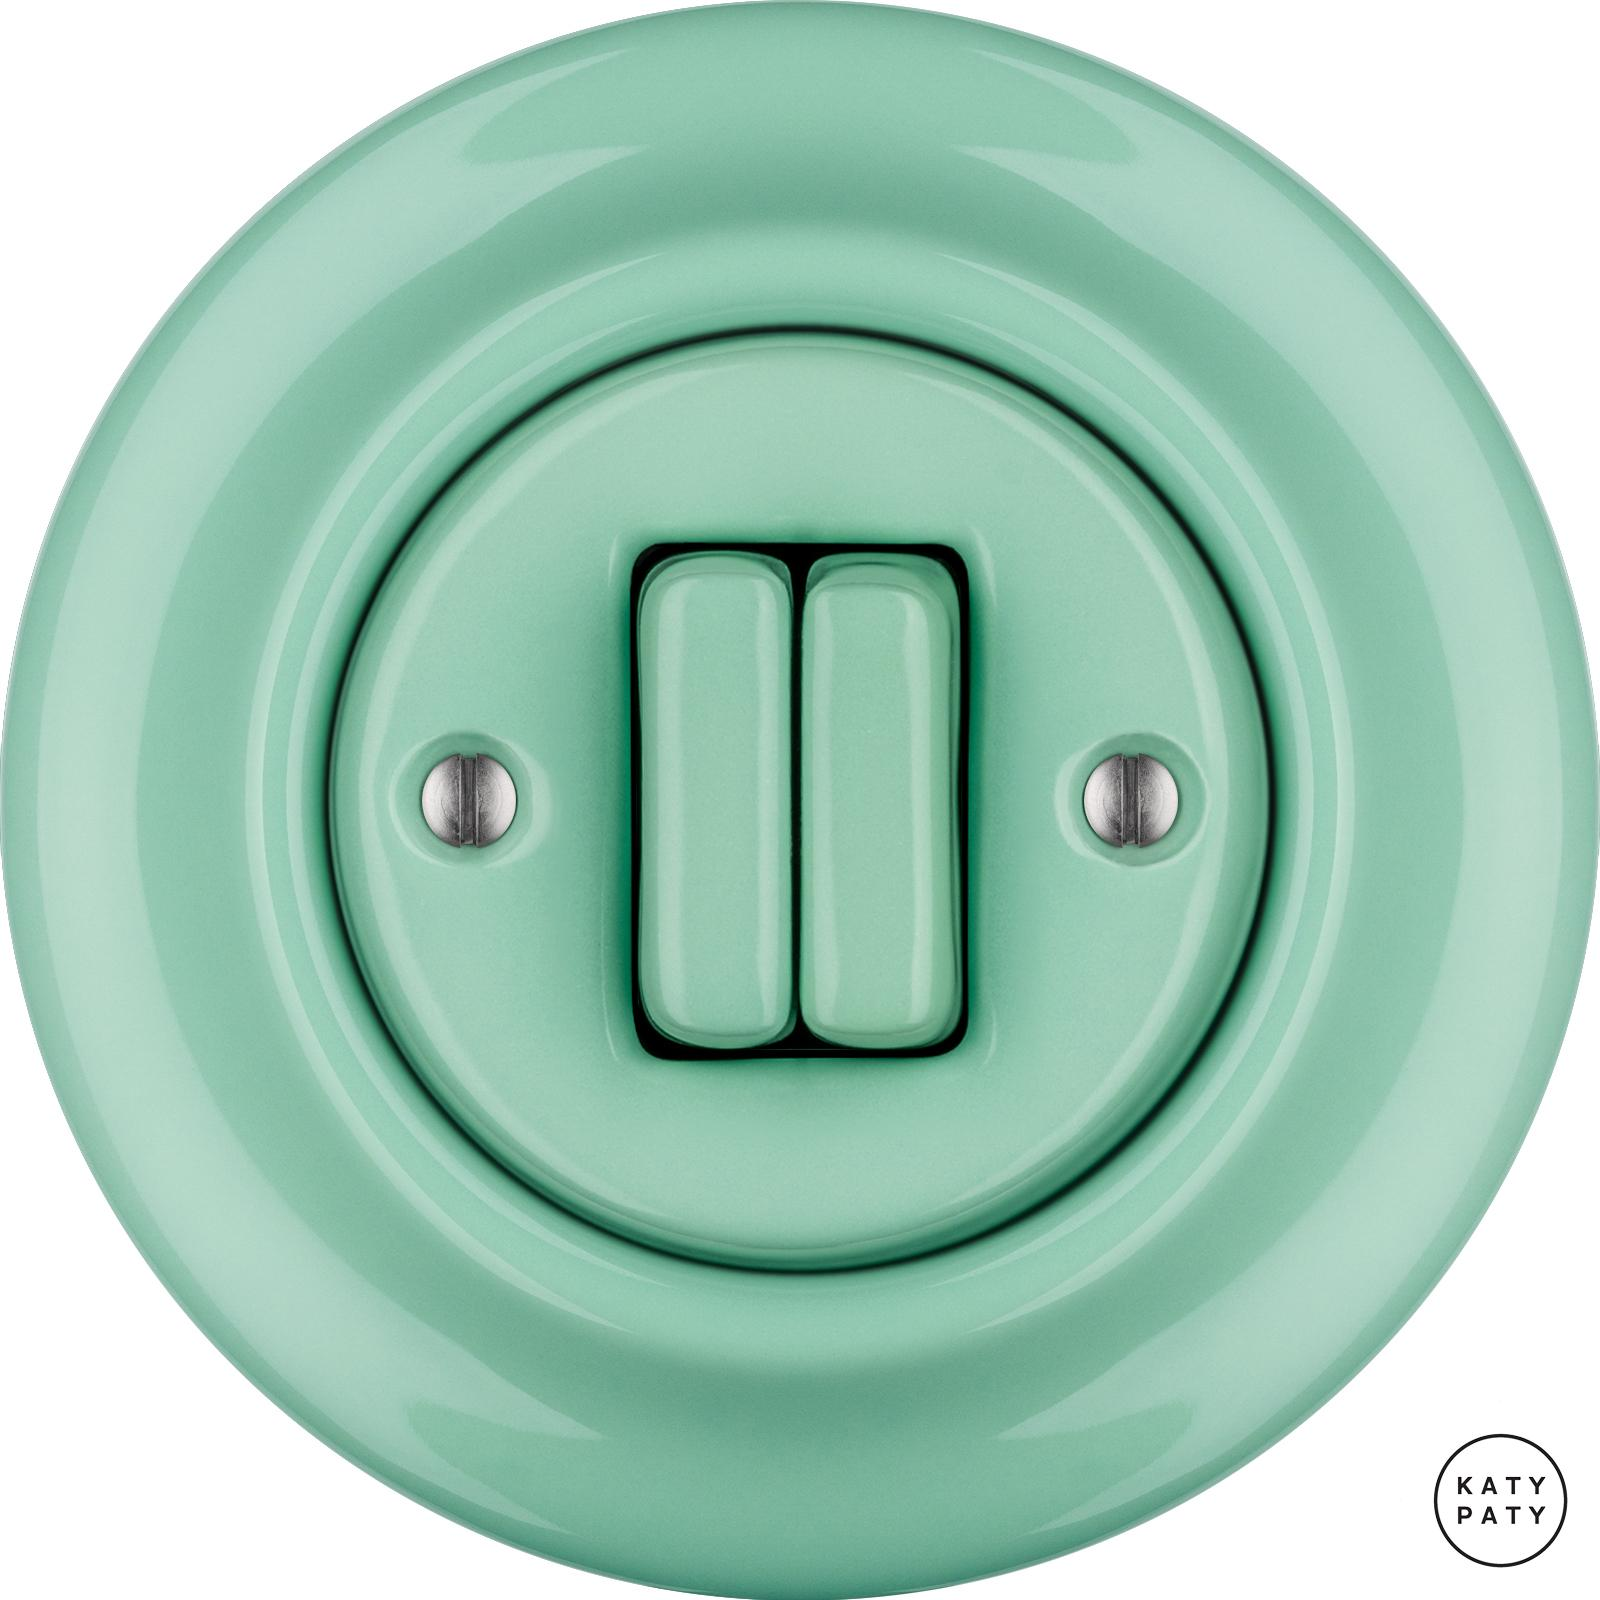 Roo Porzellan Lichtschalter - 2 Tasten - PNOE MENTOL   Katy Paty